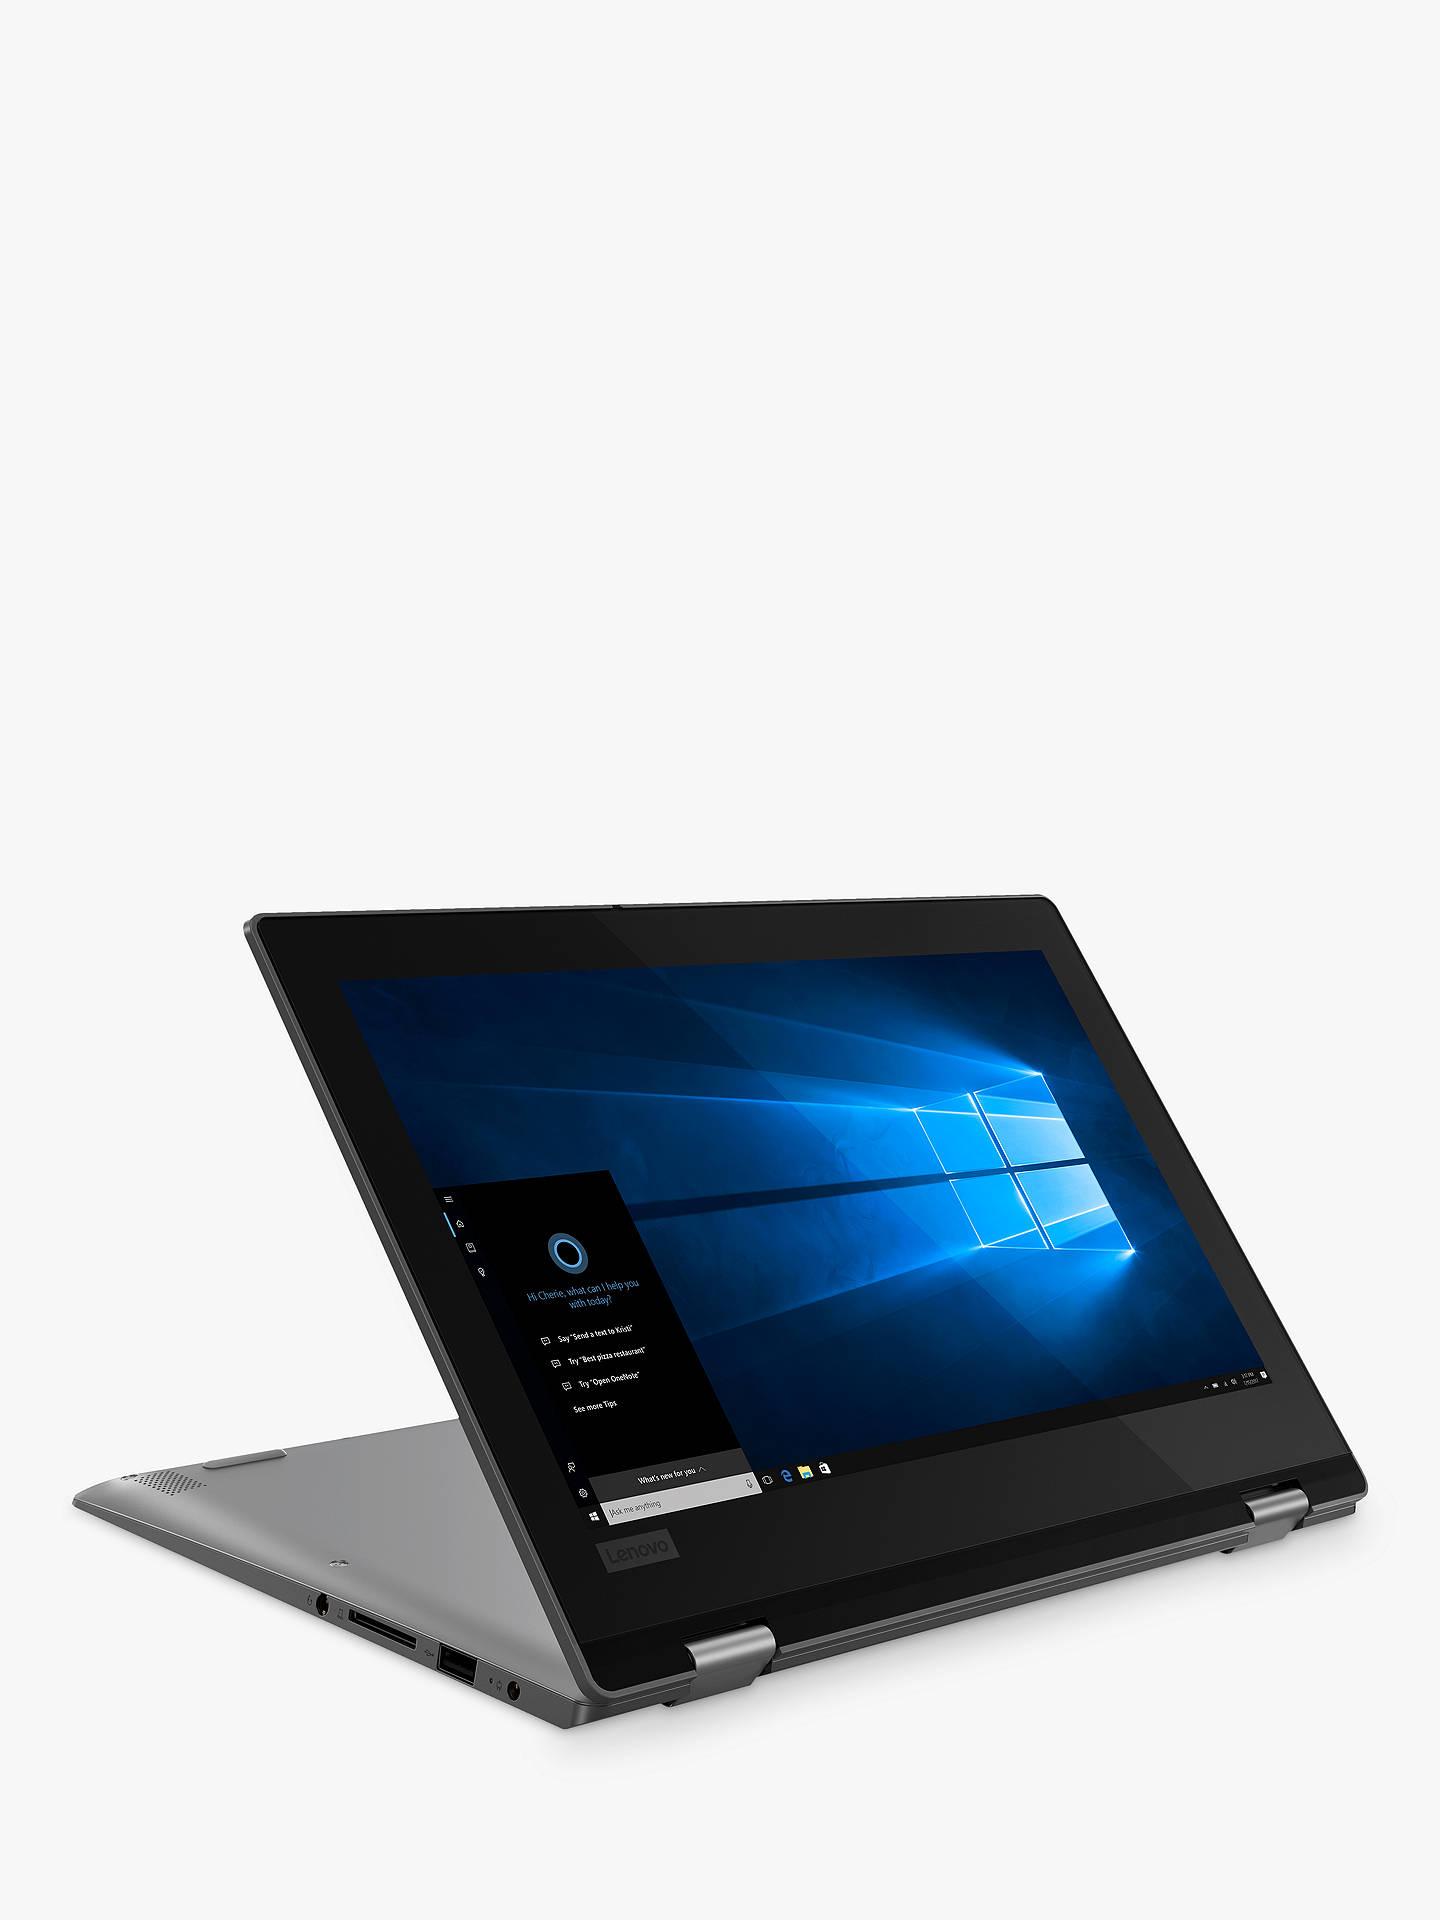 lenovo laptop serial number check online